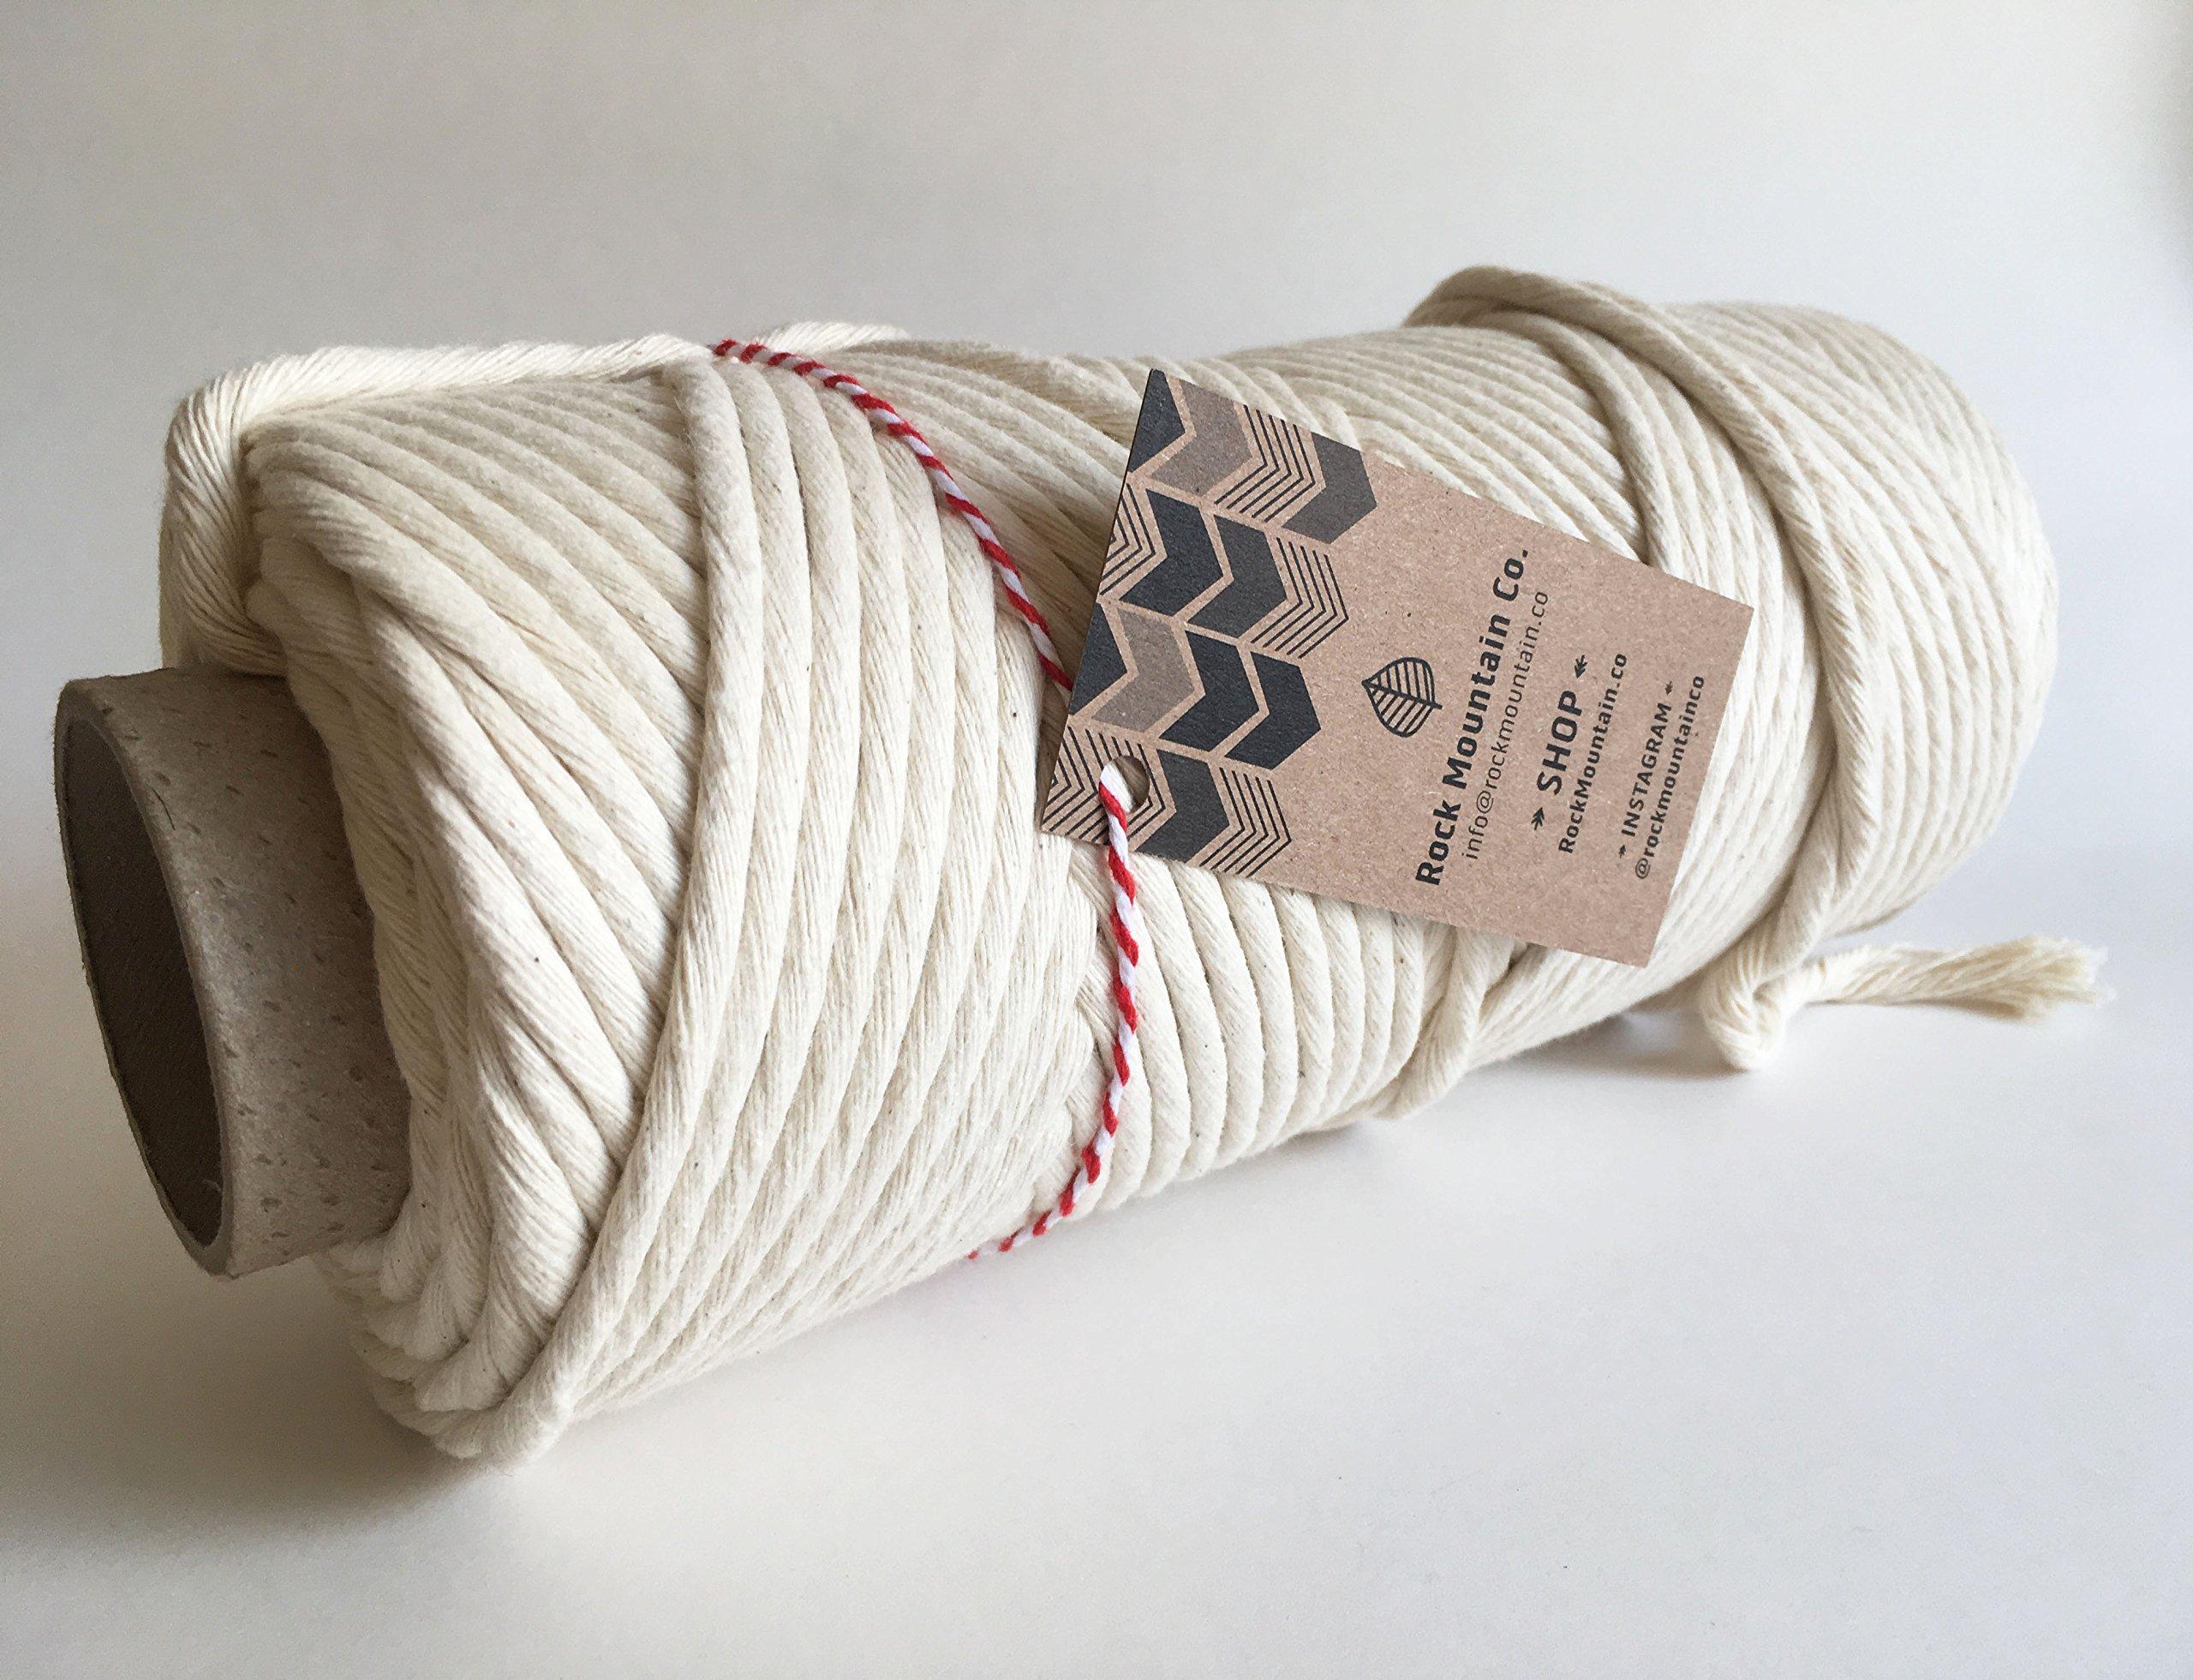 8mm Cotton Macrame Cord/Bulk Knotting Rope